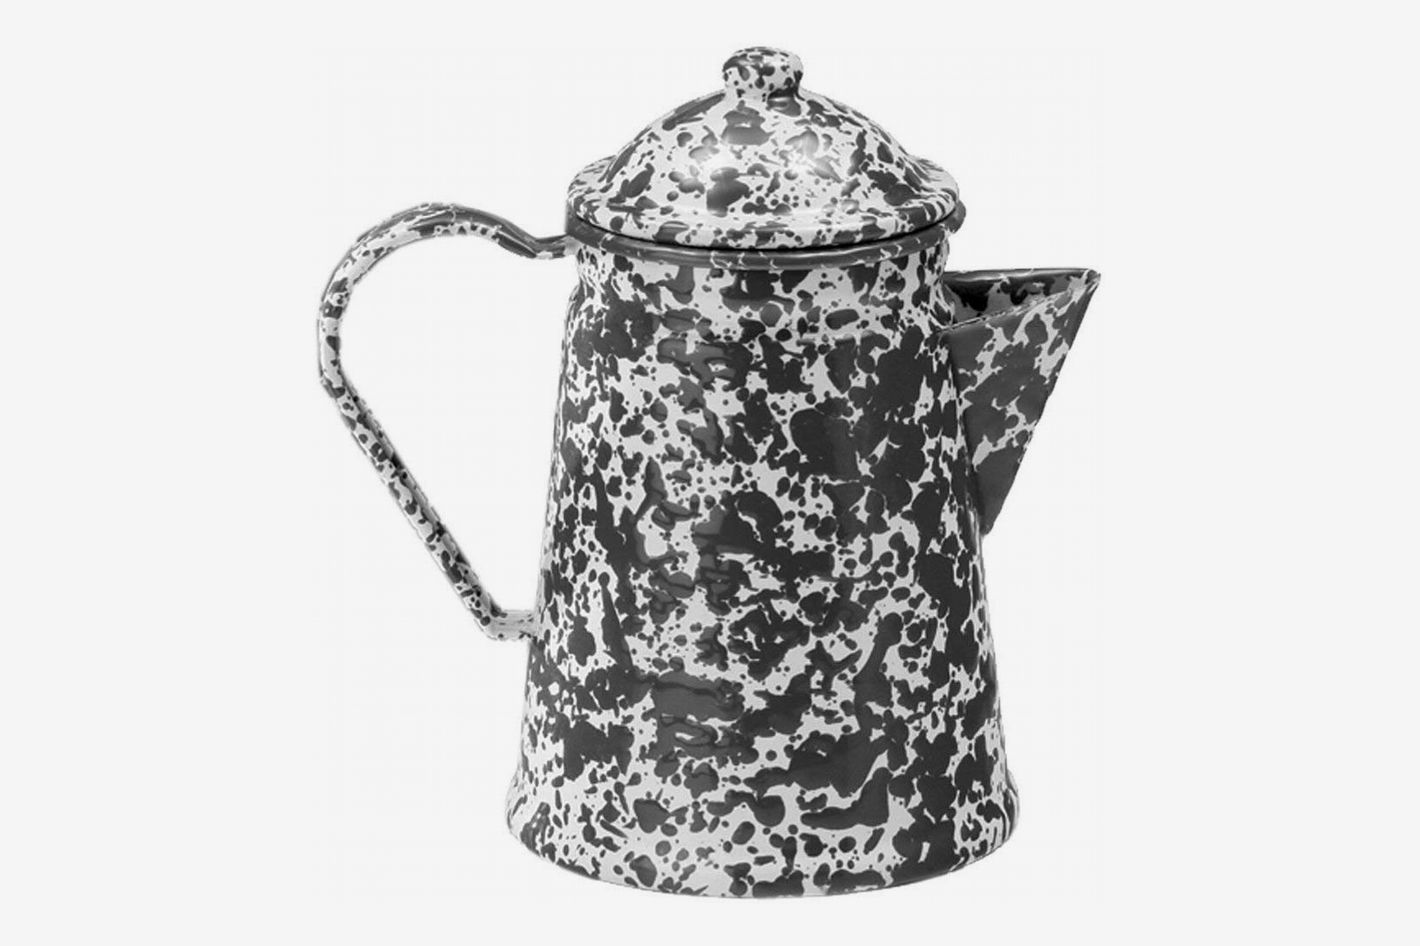 Crow Canyon Home Enamelware Coffee Pot, 1.5 quart